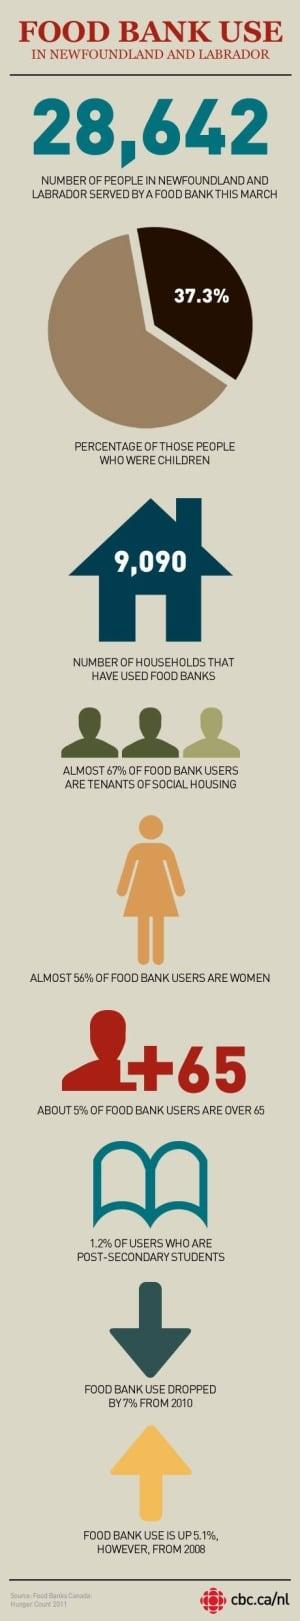 nl-food-bank-infographic